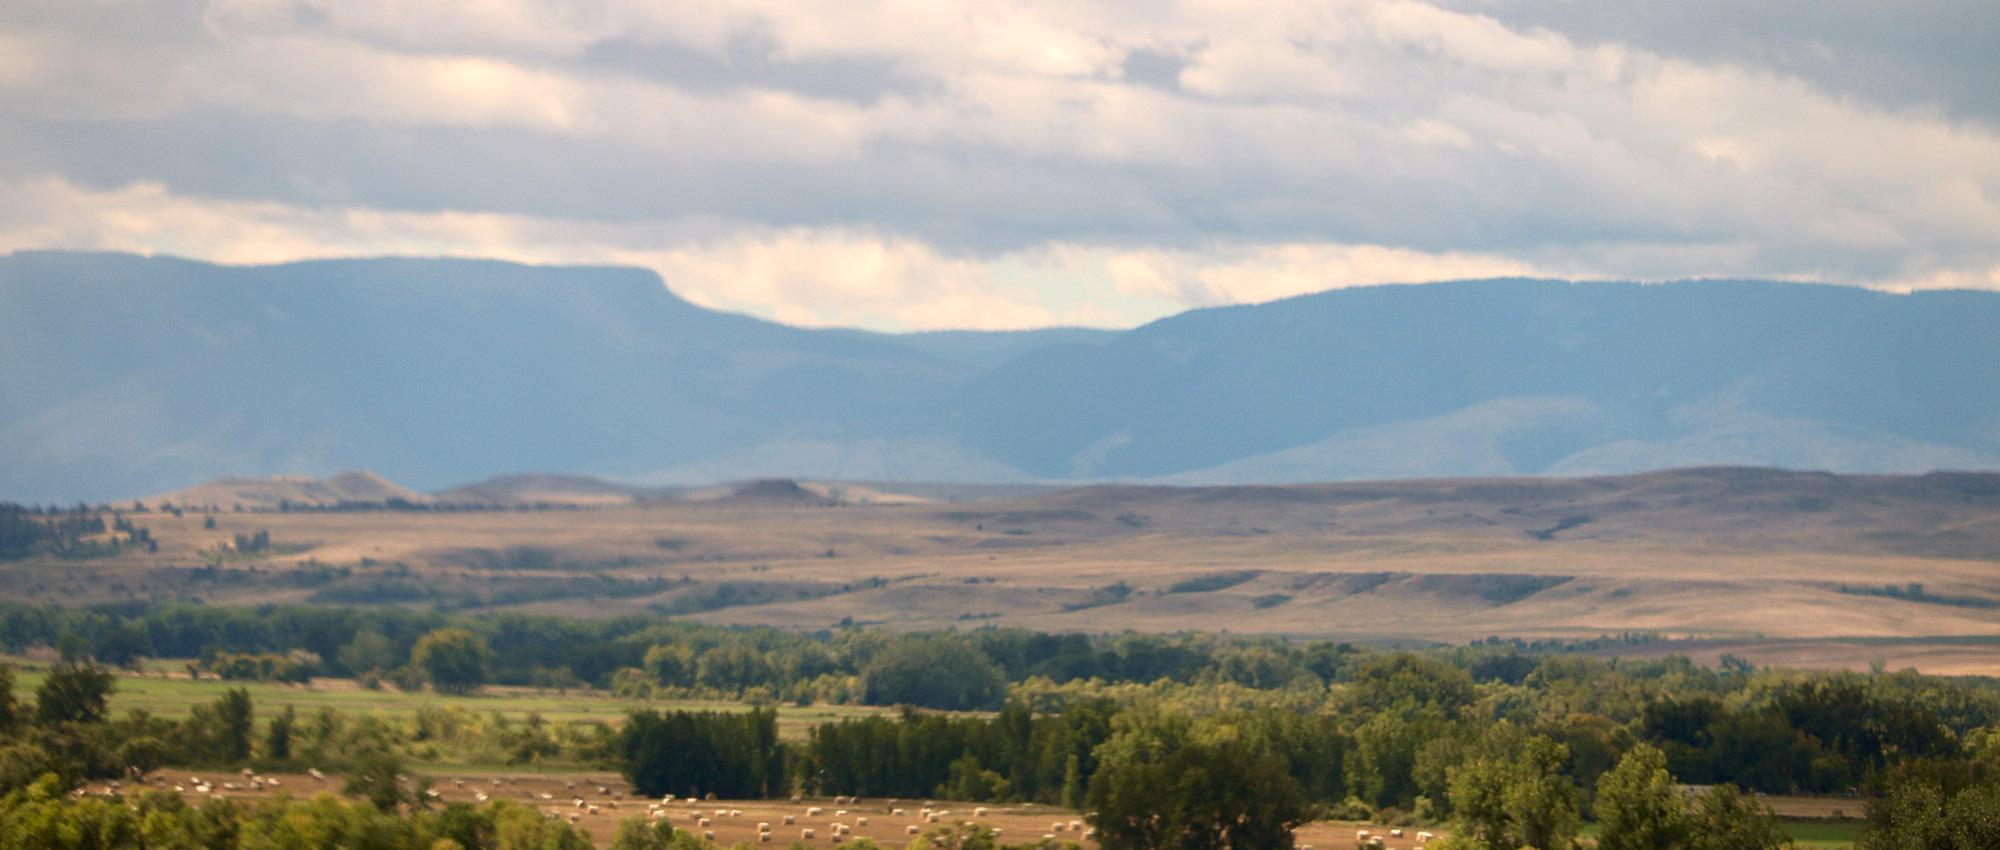 Crow Indiana Reservation landscape